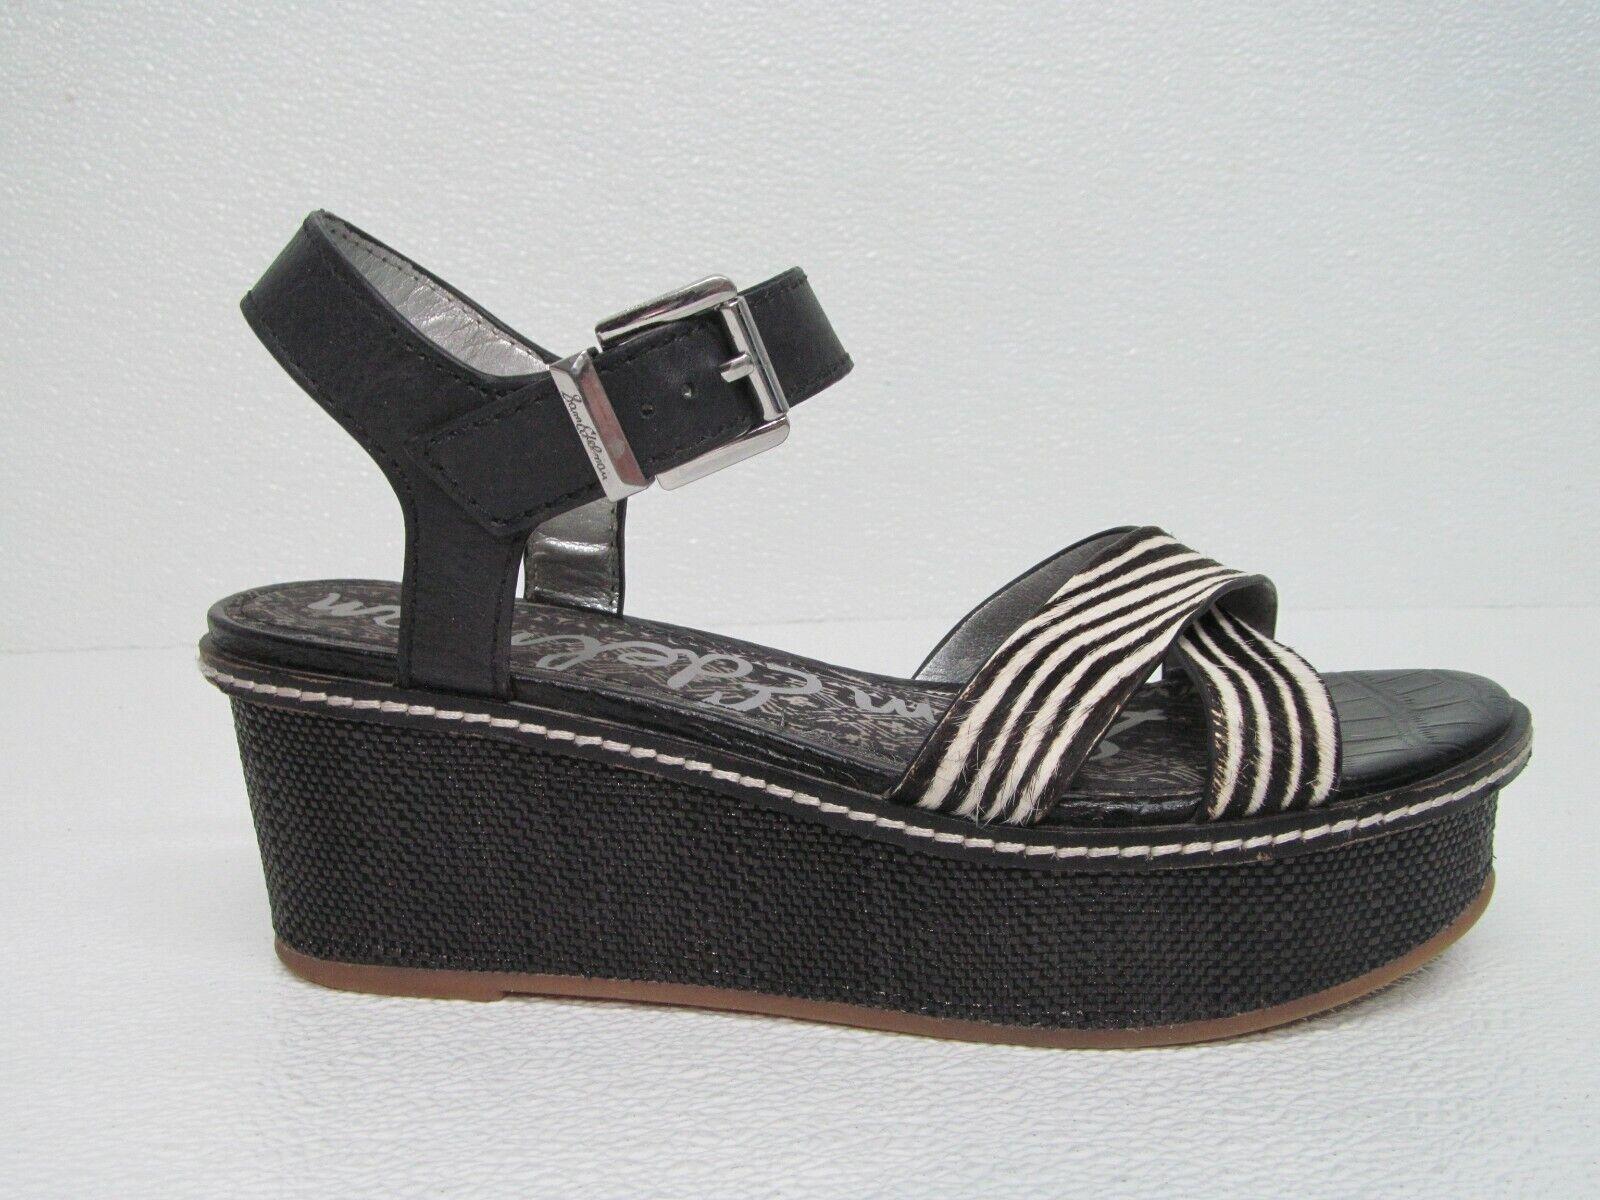 Sam Edelman Black/White Leather Calf Fur Platform Sandals Size Womens 8.5M